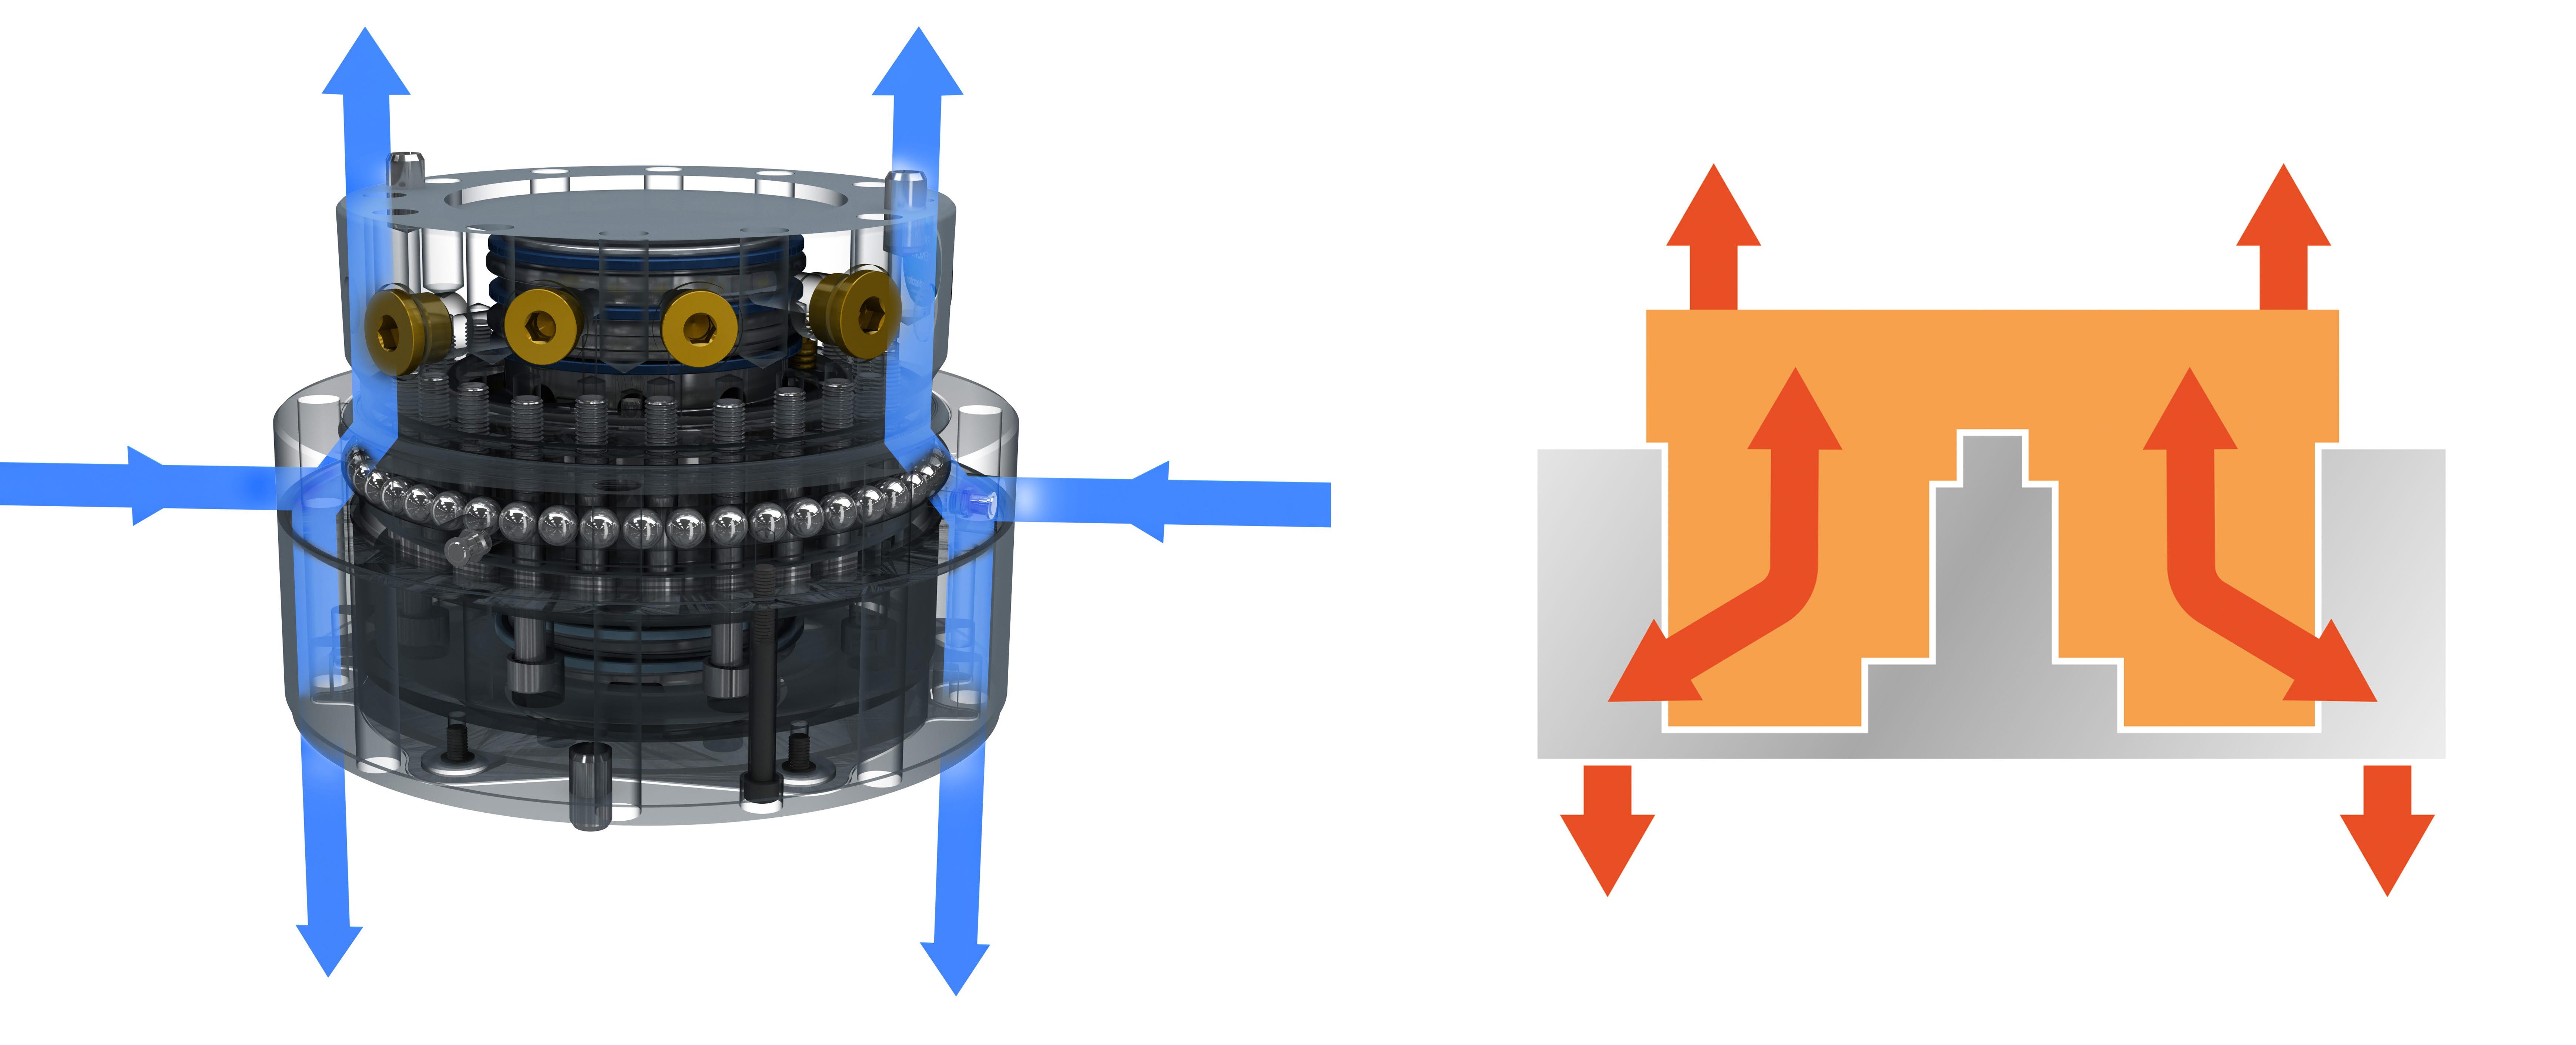 PHILIPP ForstWerkzeuge INDEXATOR Rotator XR 300 patented torque transfer, Kompaktrotatoren, XR-Kompaktrotator, hydraulischer Rotator, hydraulischer Drehservo, hydraulischer Drehmotor